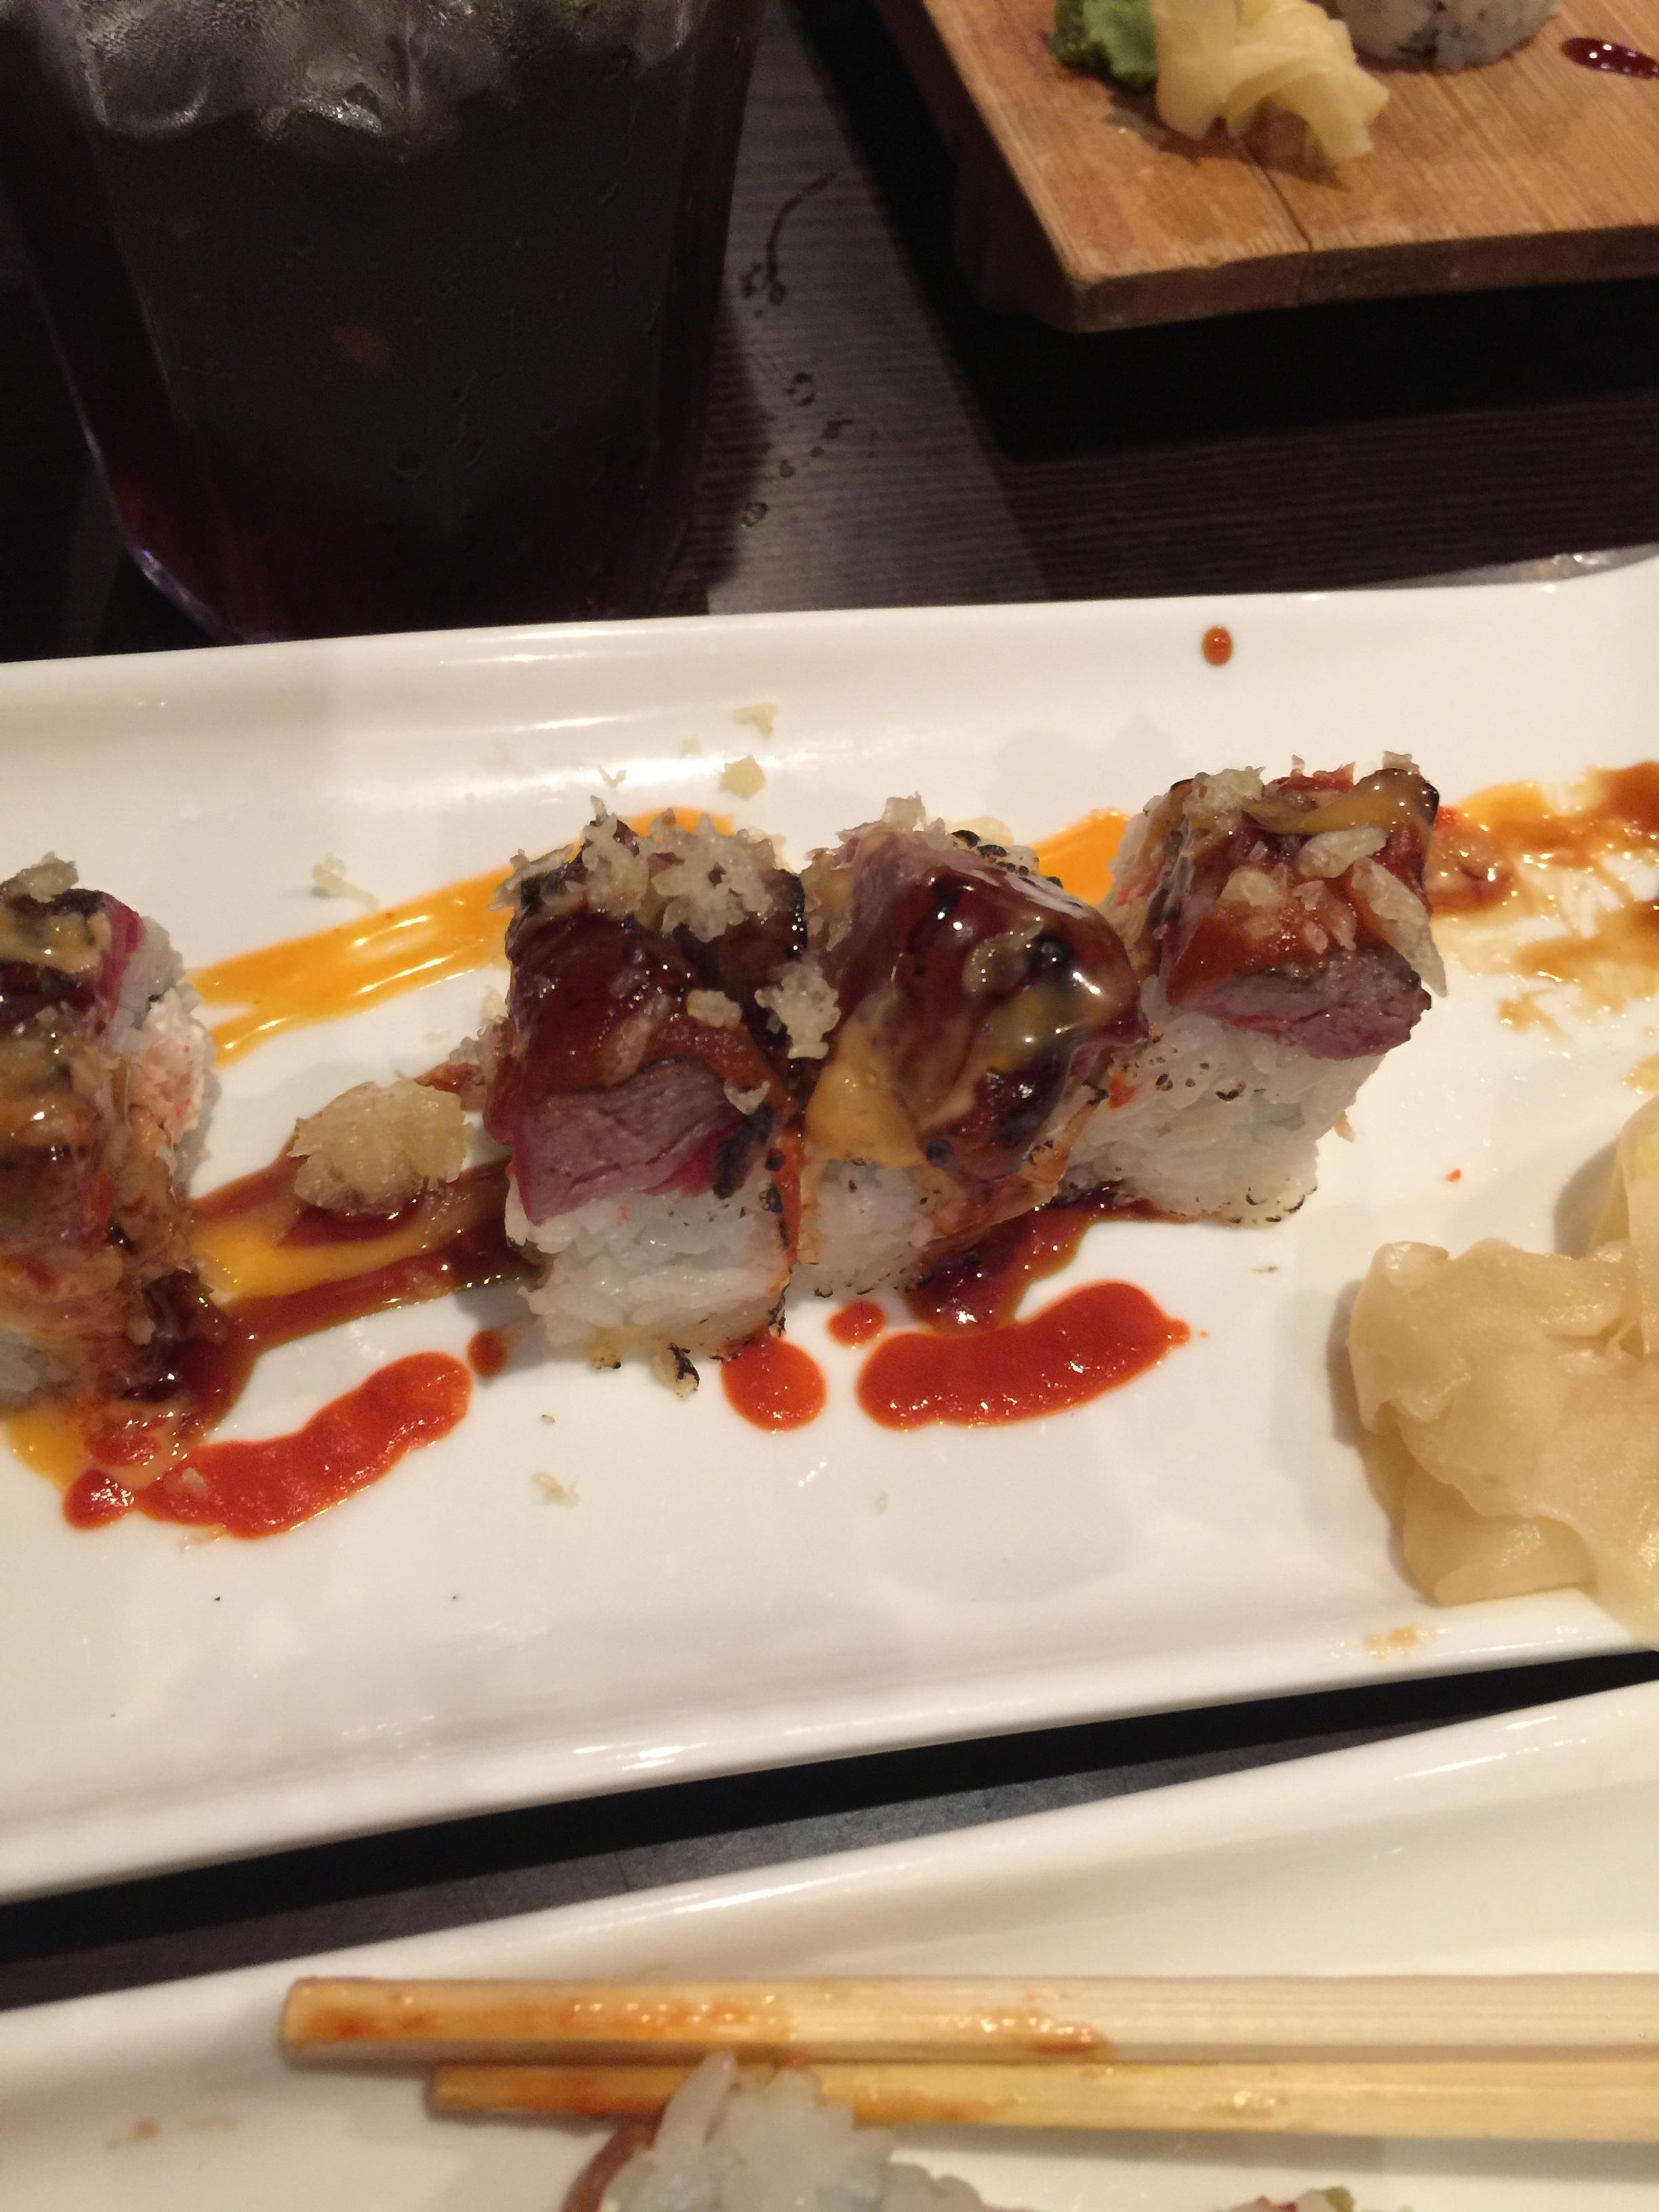 Last dinner: sushi in the form of the Jonesboro Roll--no joke! It was delicious!